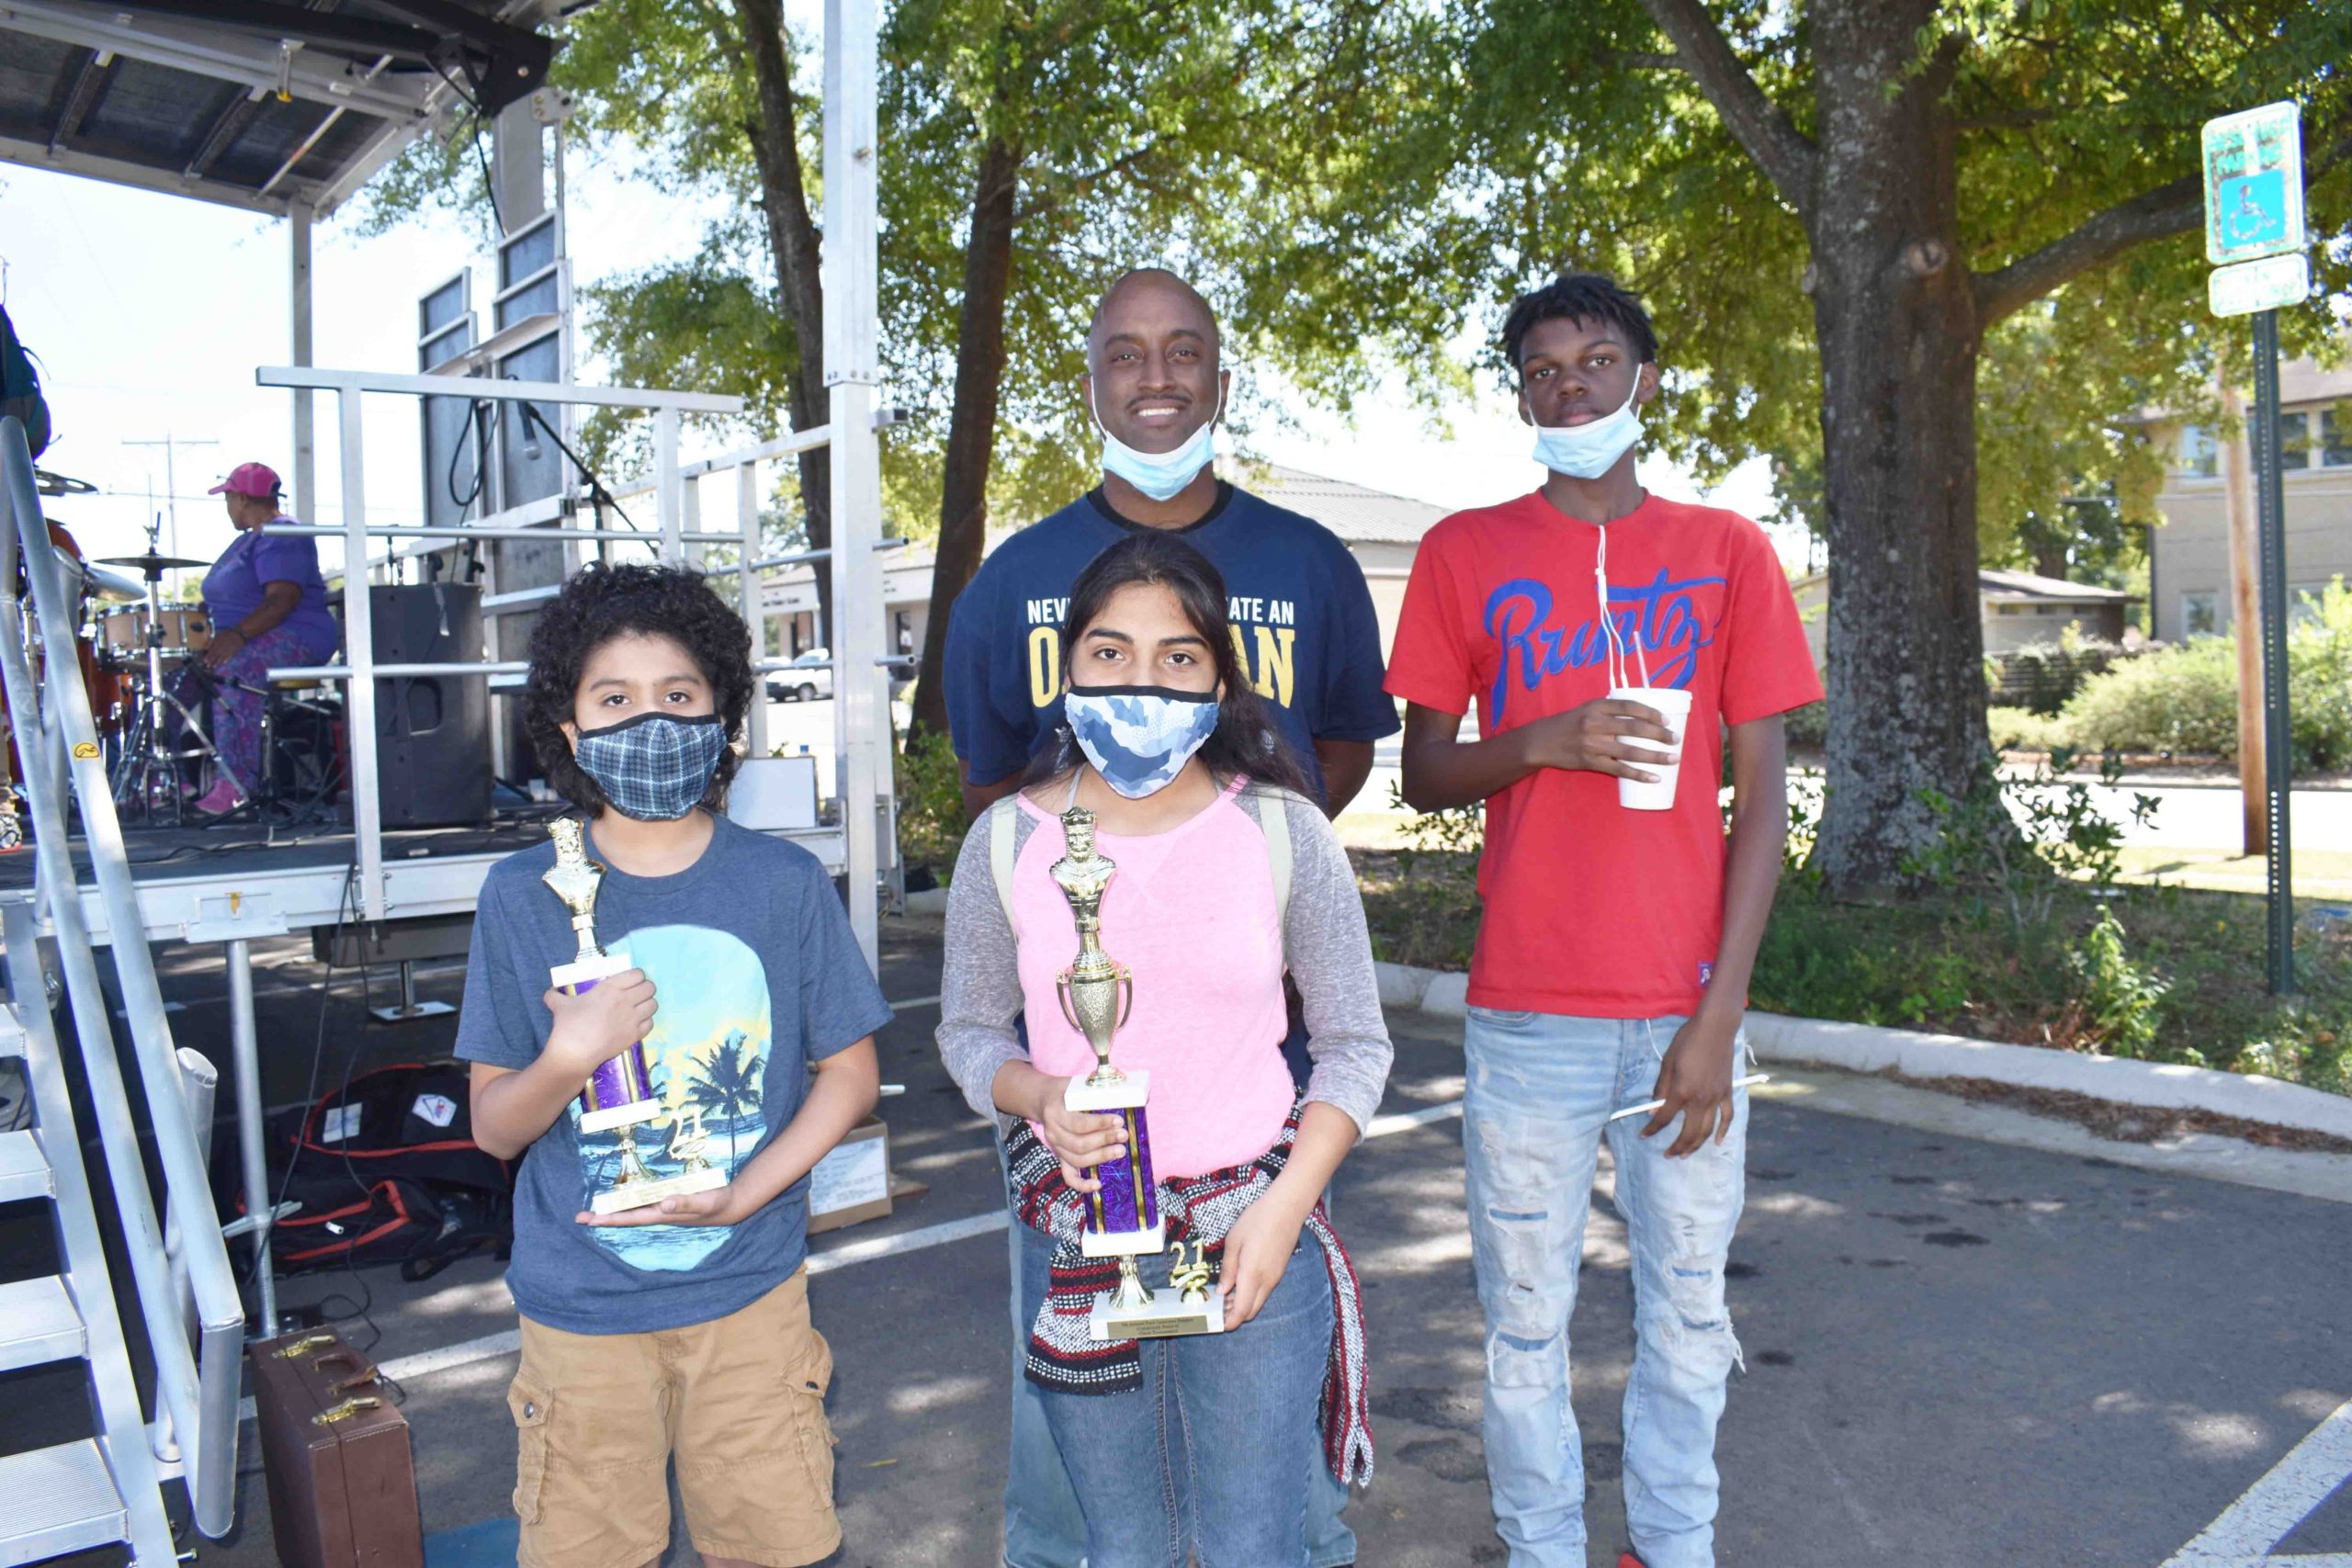 Christian Aguinaga (6th grade chess champion), Kaitlyn Aguinaga (9th grade chess champion), Darius McCree, Sr. (chess coach), Mikel Green (11th grade chess champion)